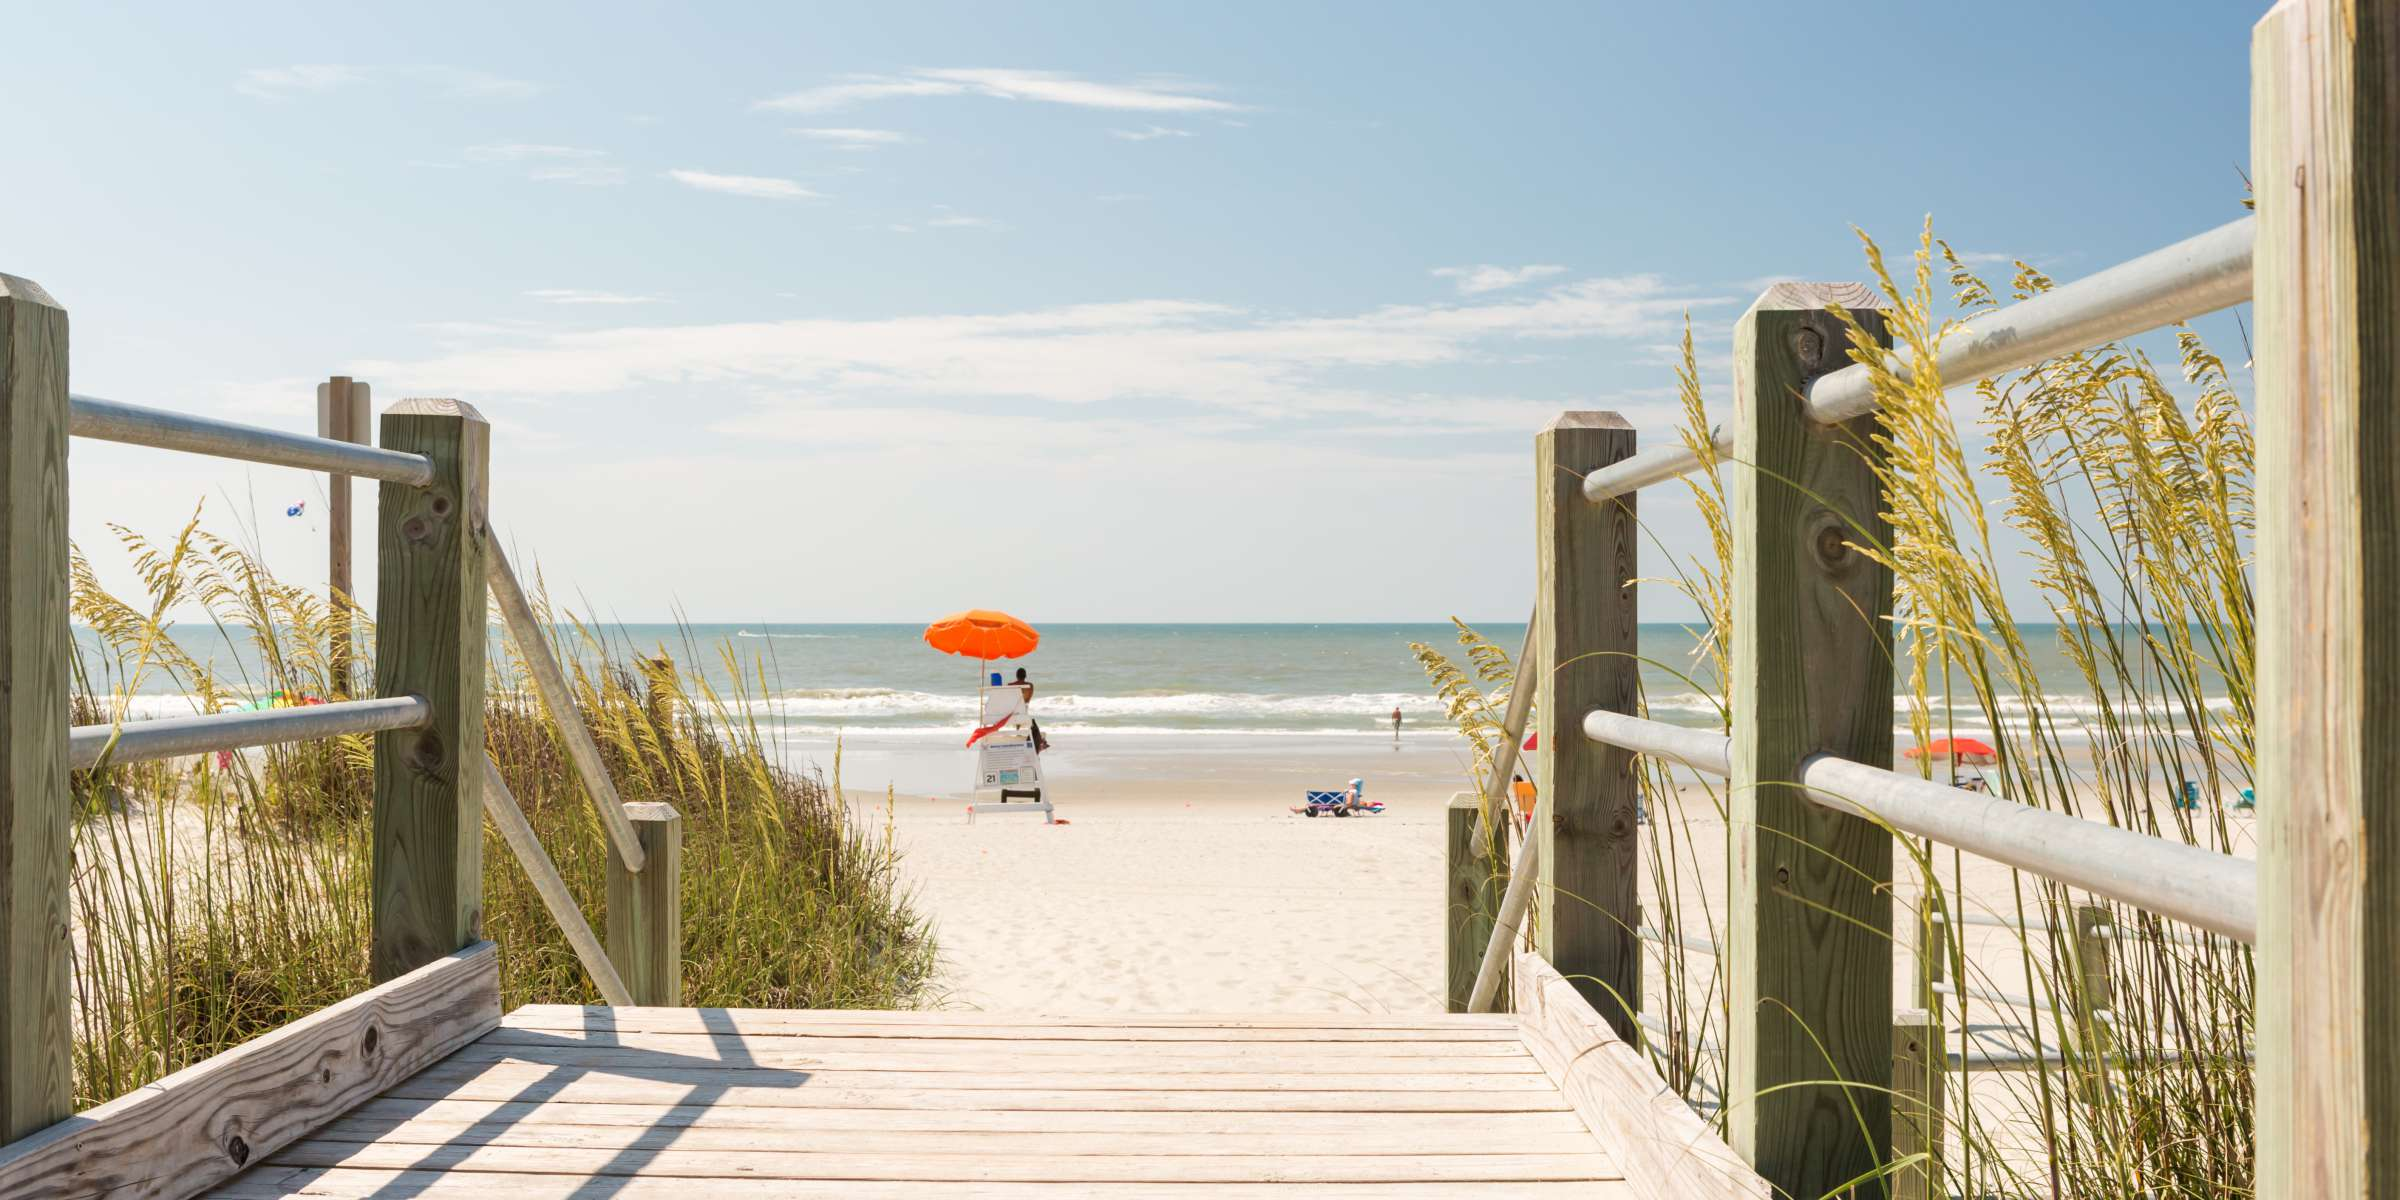 Hotel & Resort Deals in Myrtle Beach, South Carolina